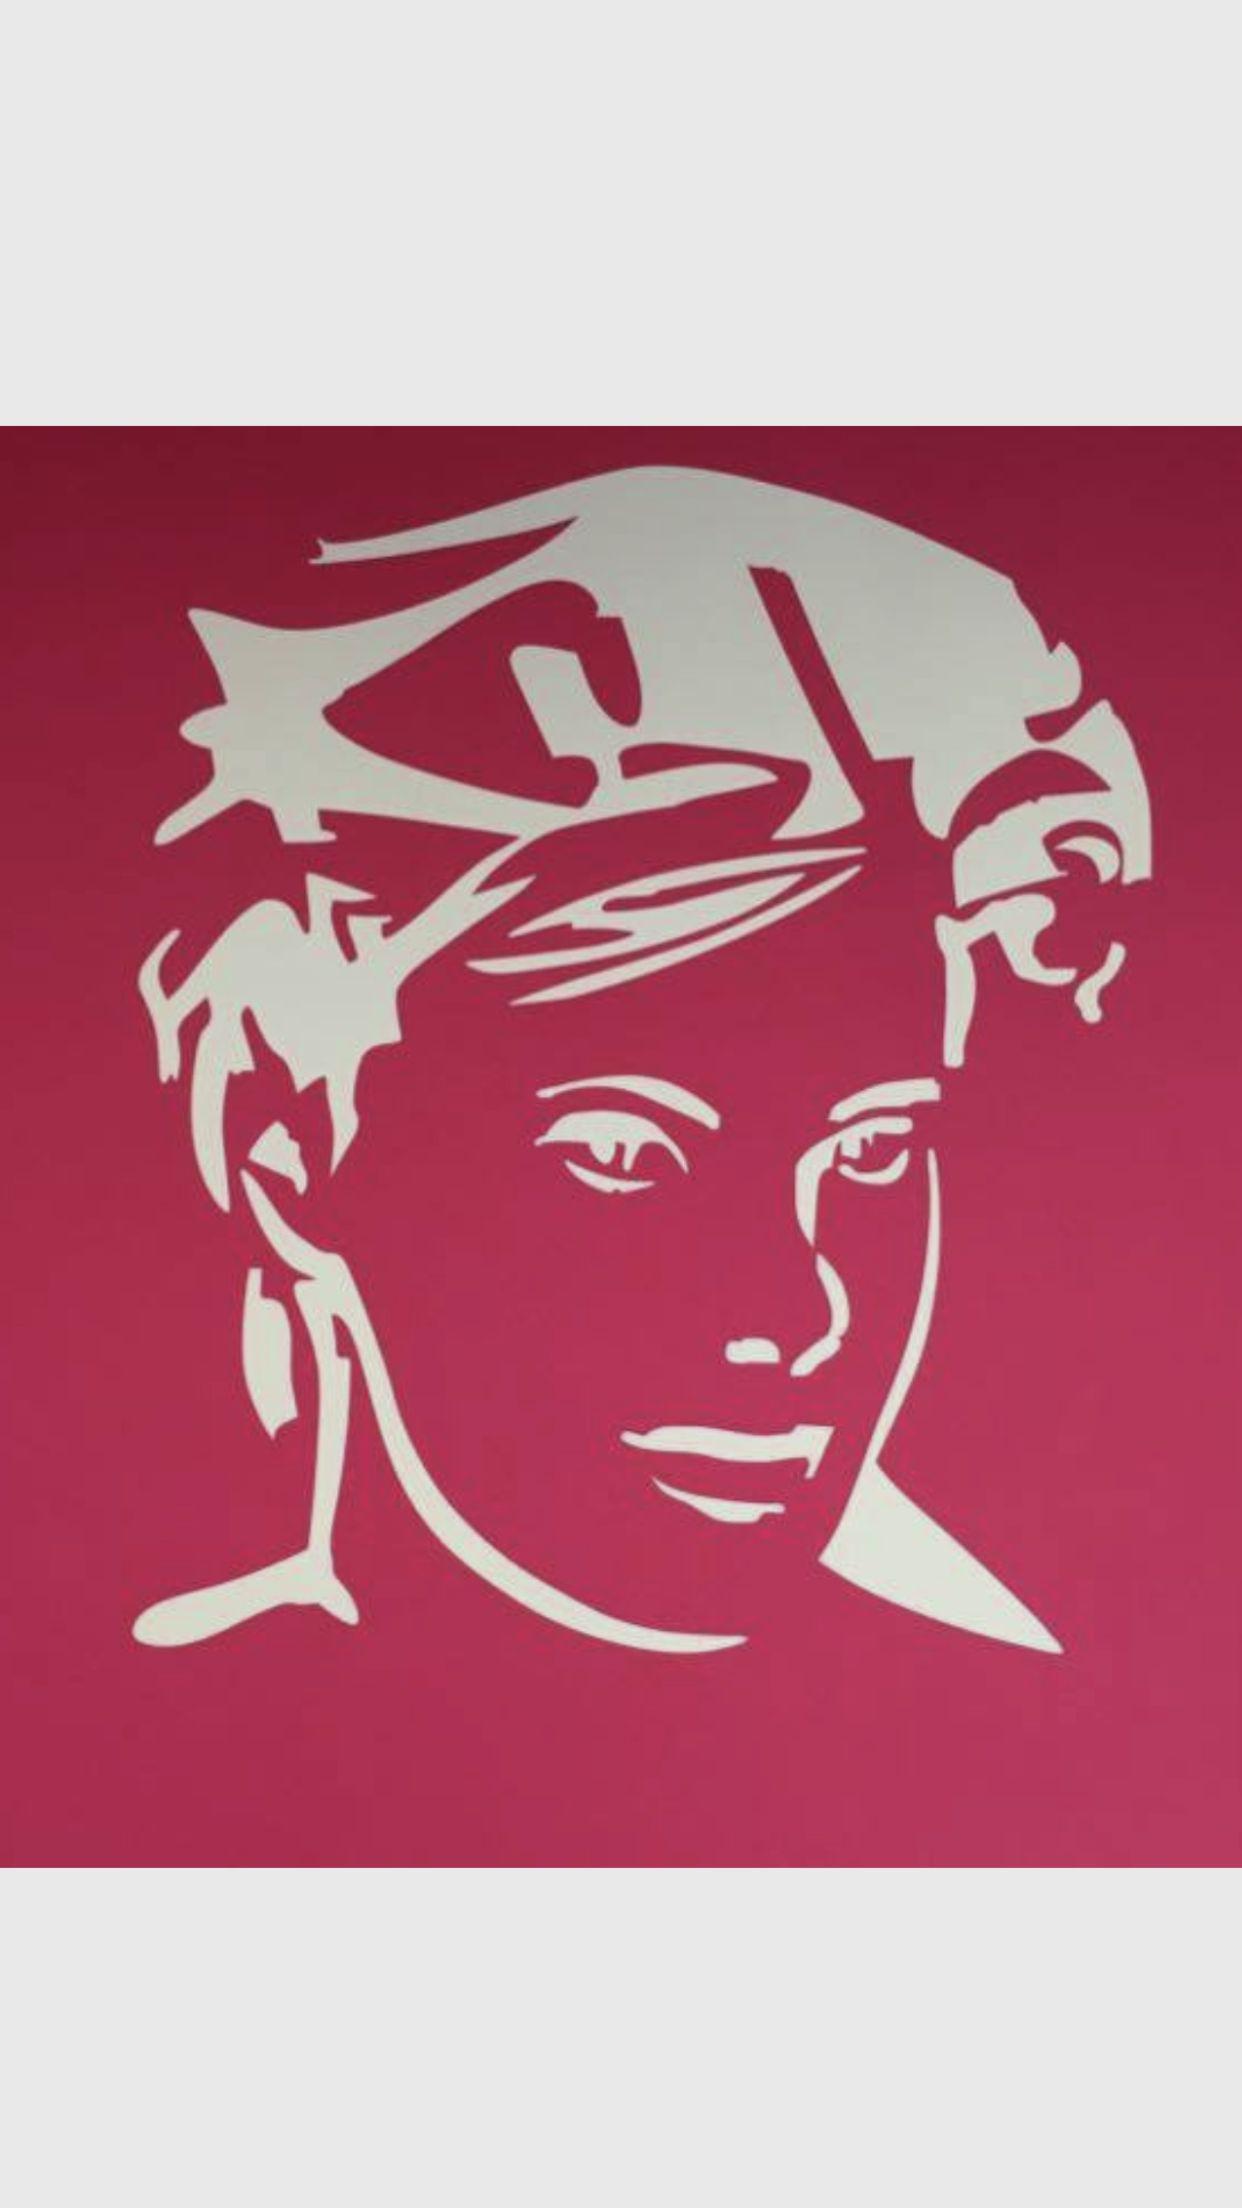 Friseursalon Silvana Janke